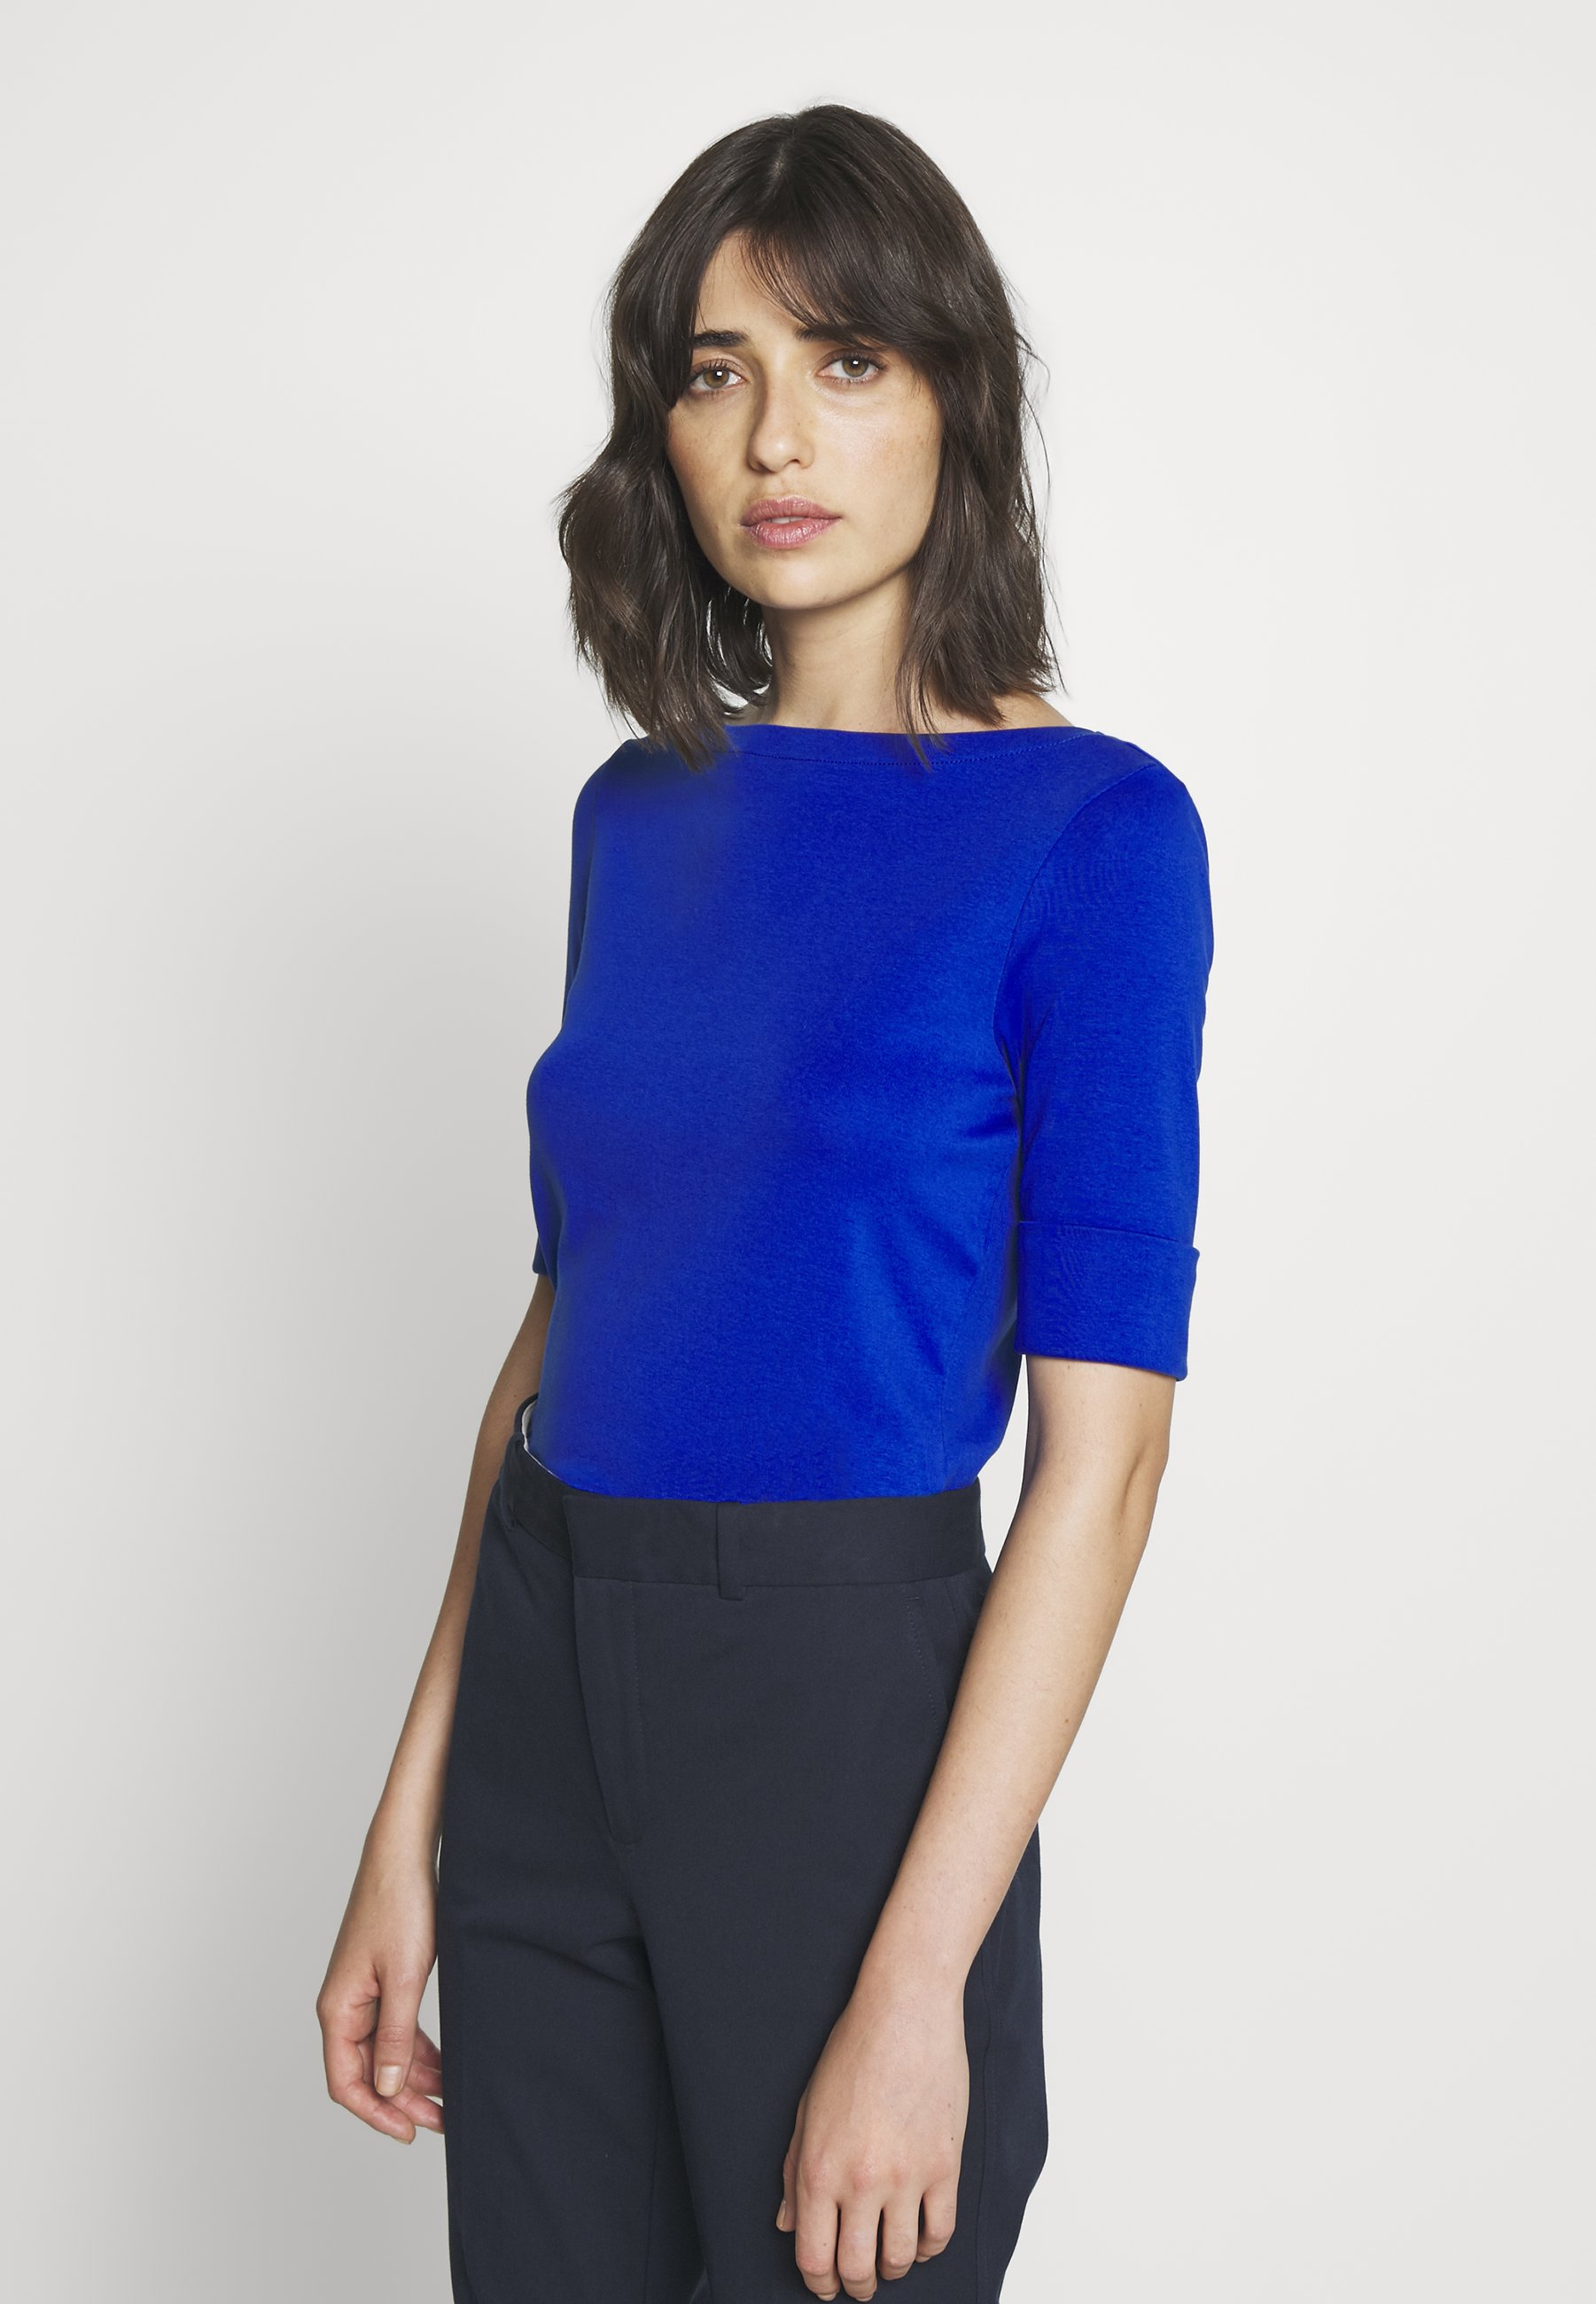 Lauren Ralph Lauren T-shirts - blue glacier